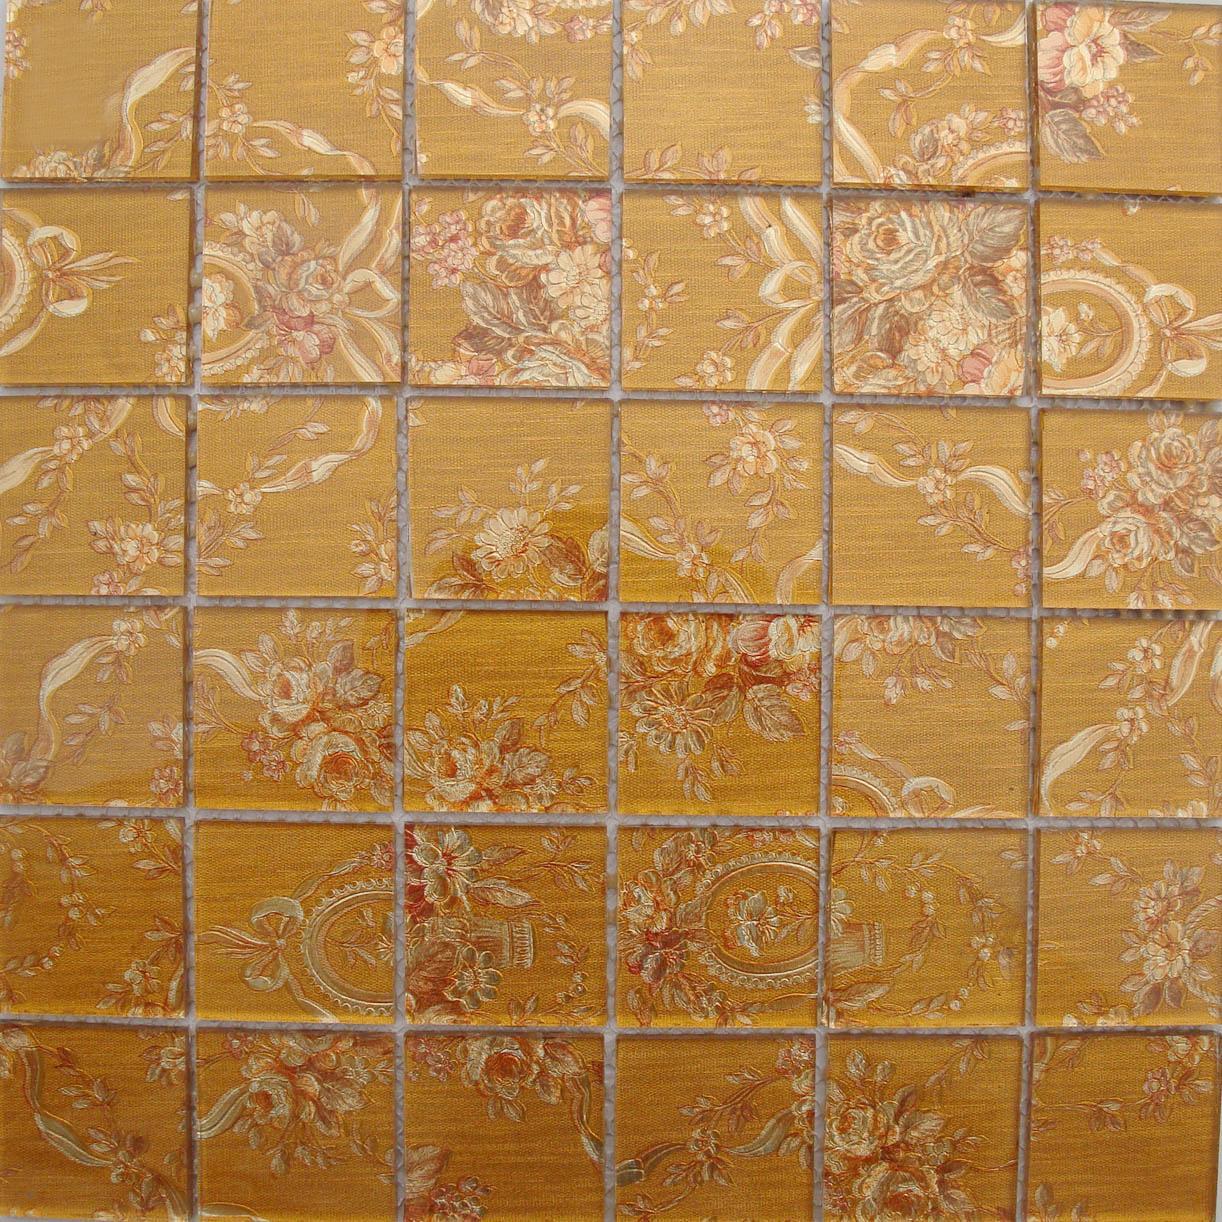 Wholesale Crystal Glass Mosaic Tiles Washroom Backsplash